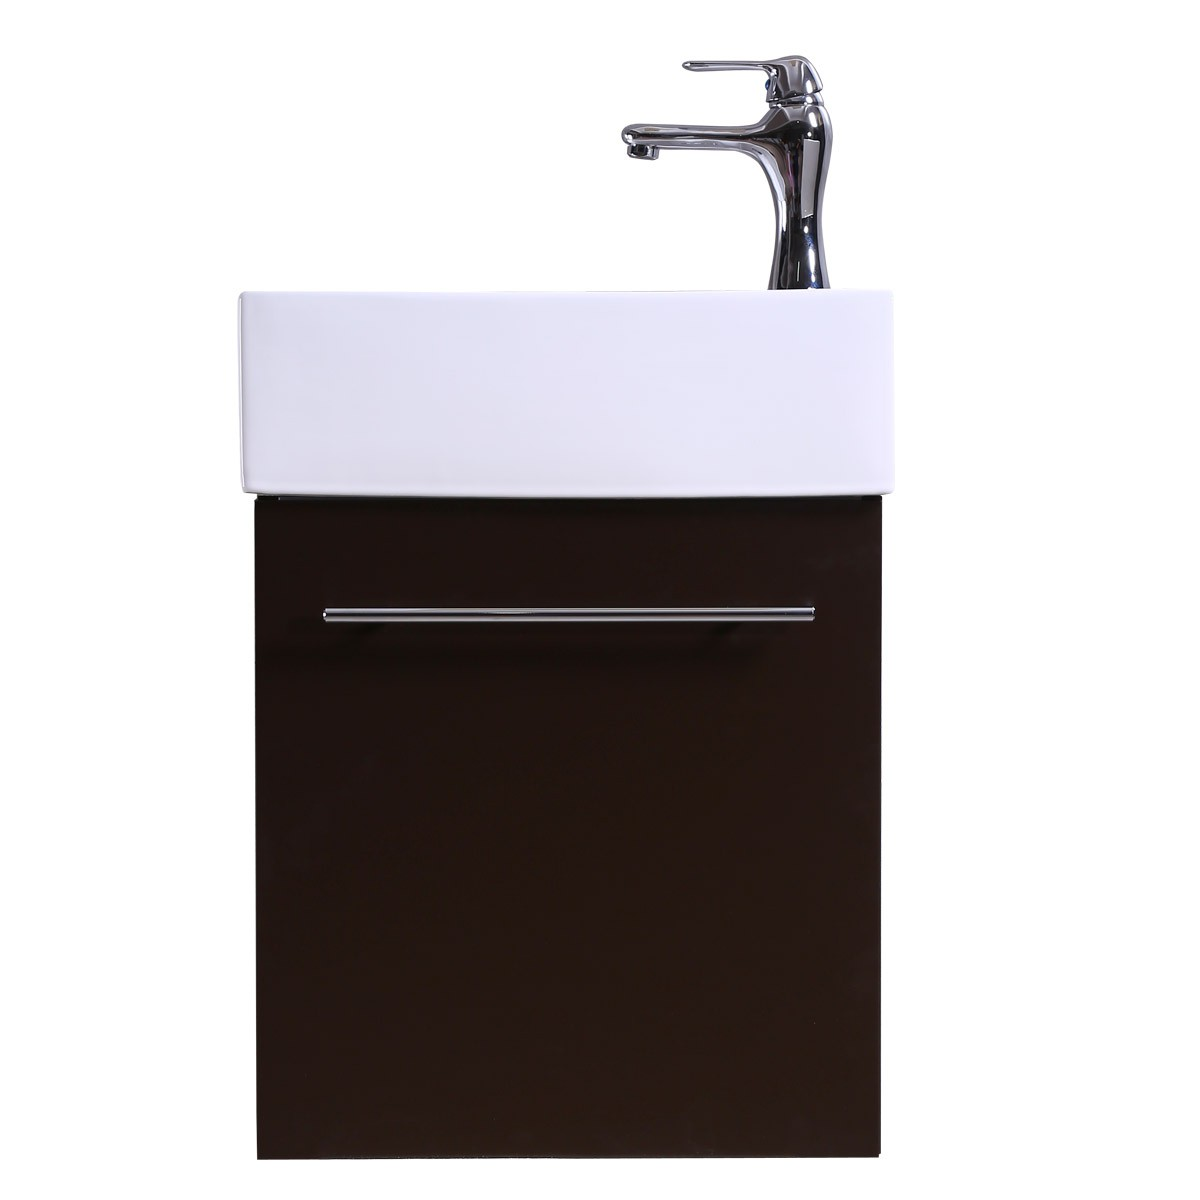 17 small white vanity bathroom sink black cabinet with - Small bathroom sink cabinet ...